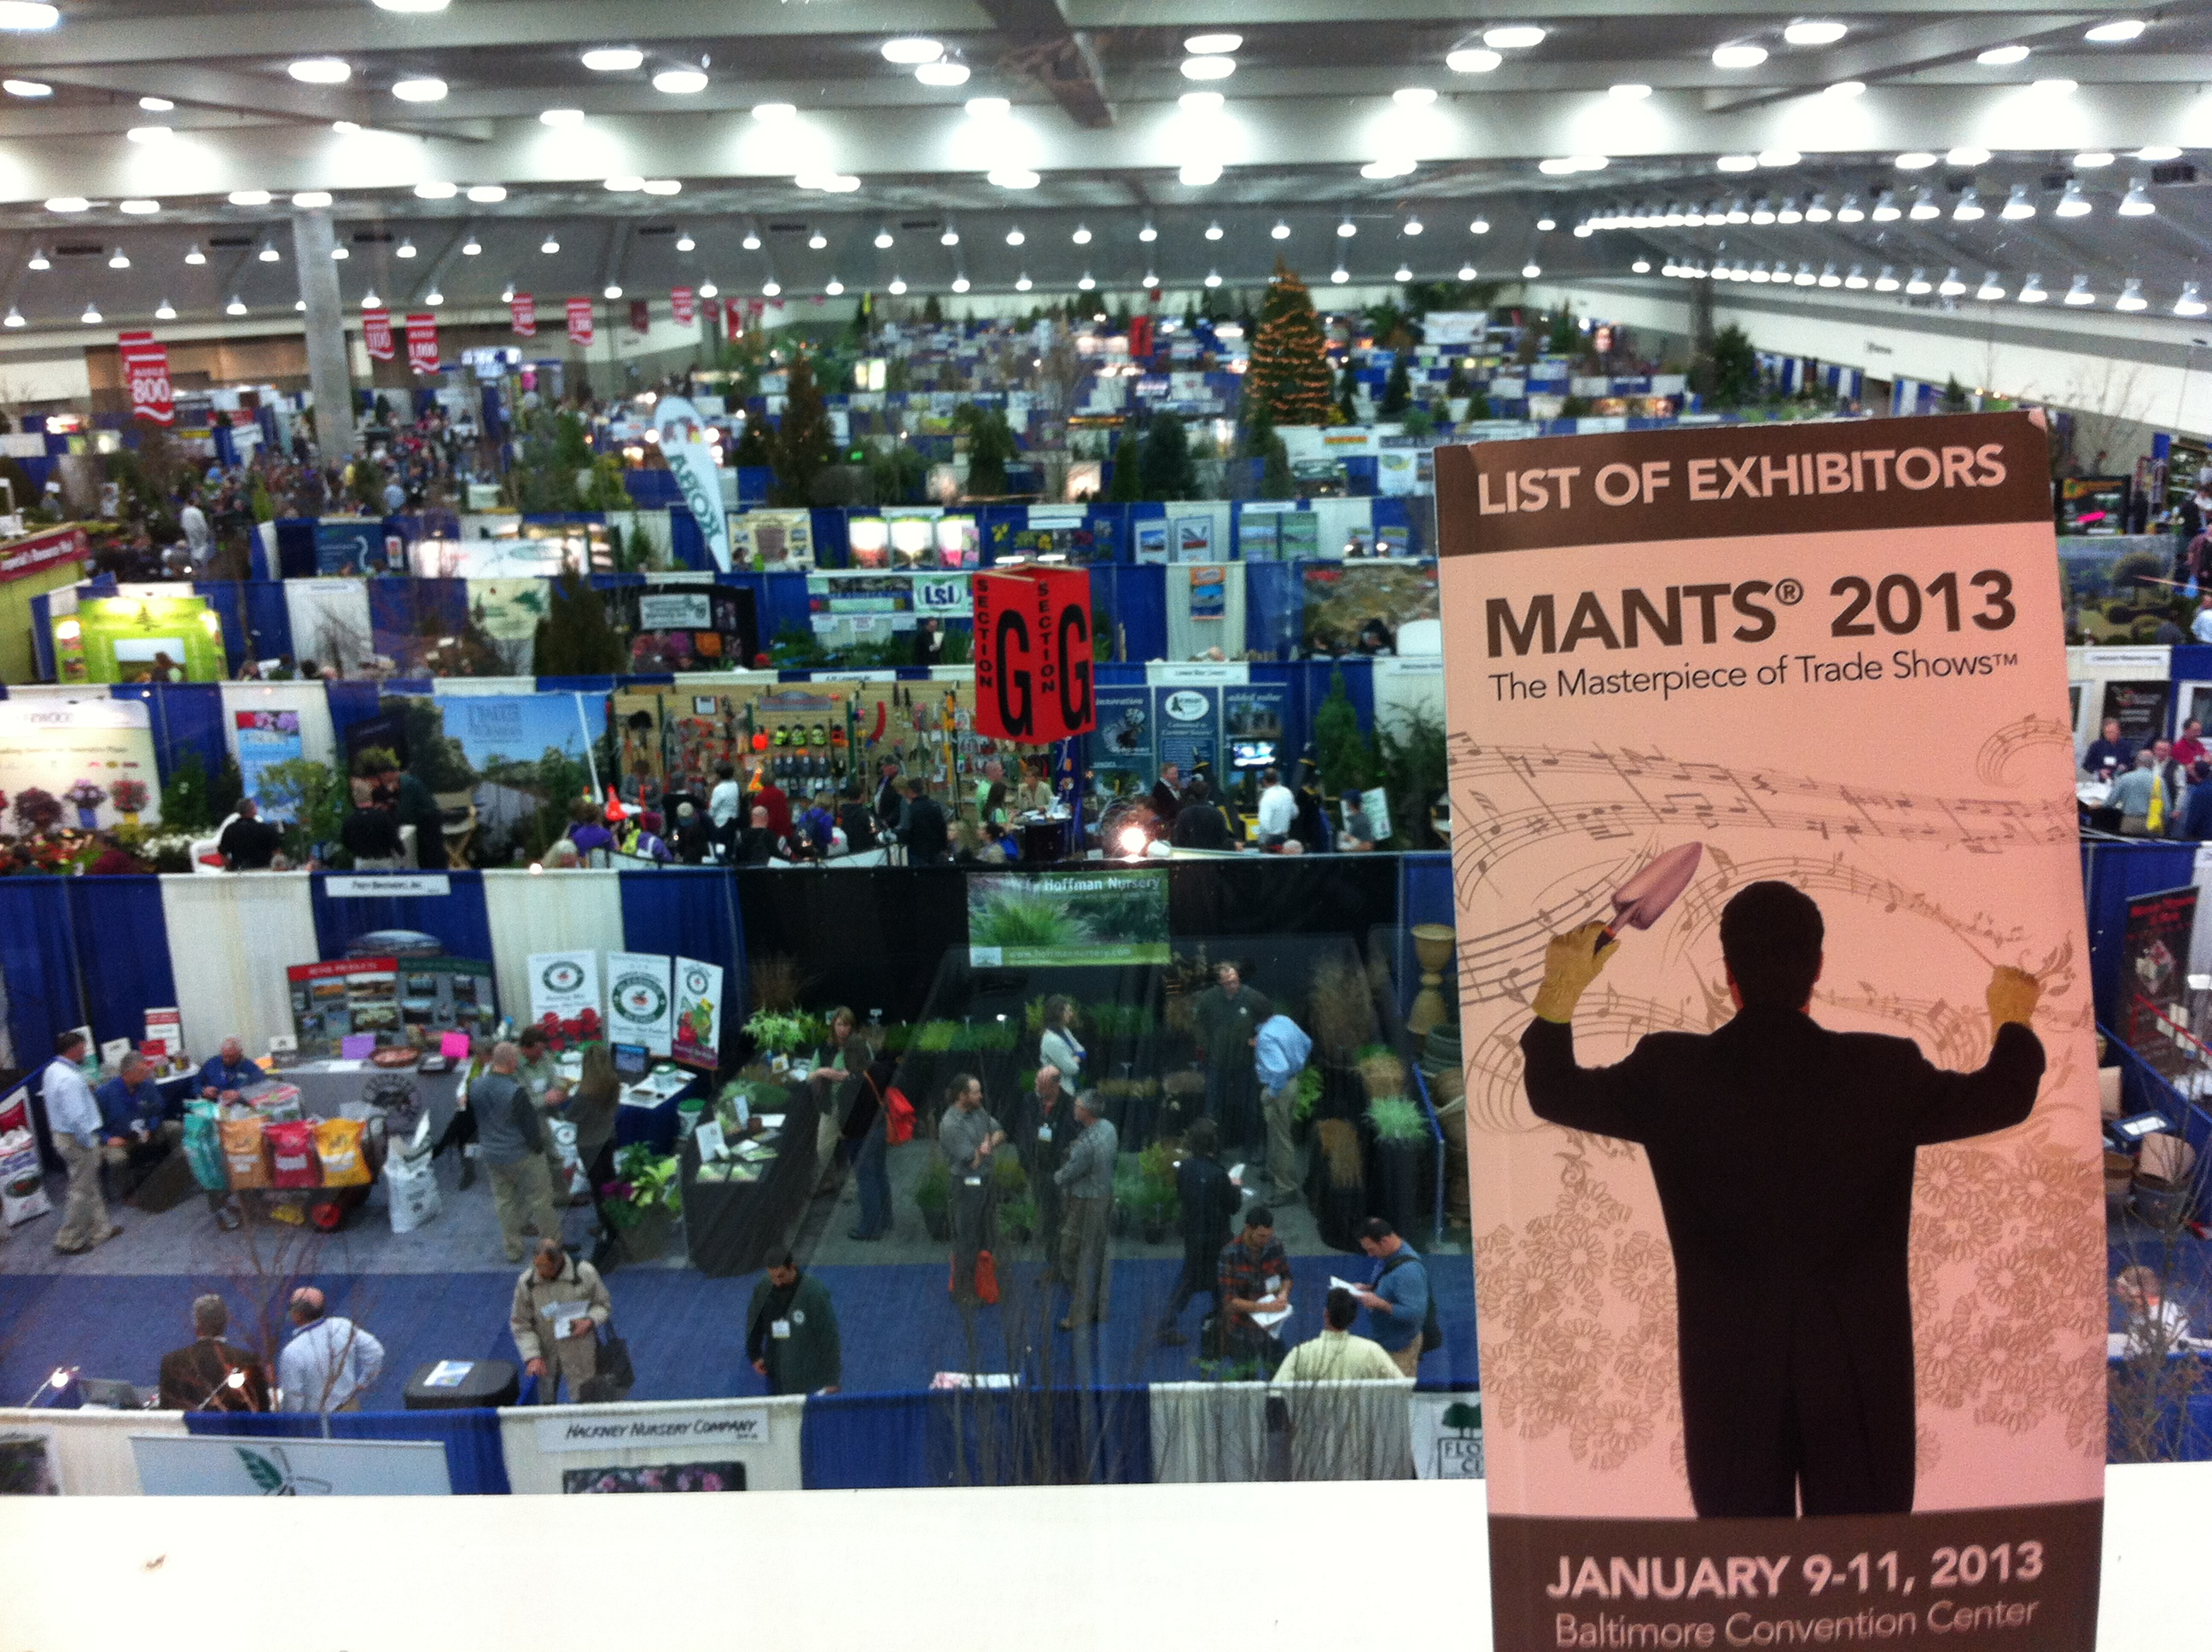 MANTS 2013, garden media group